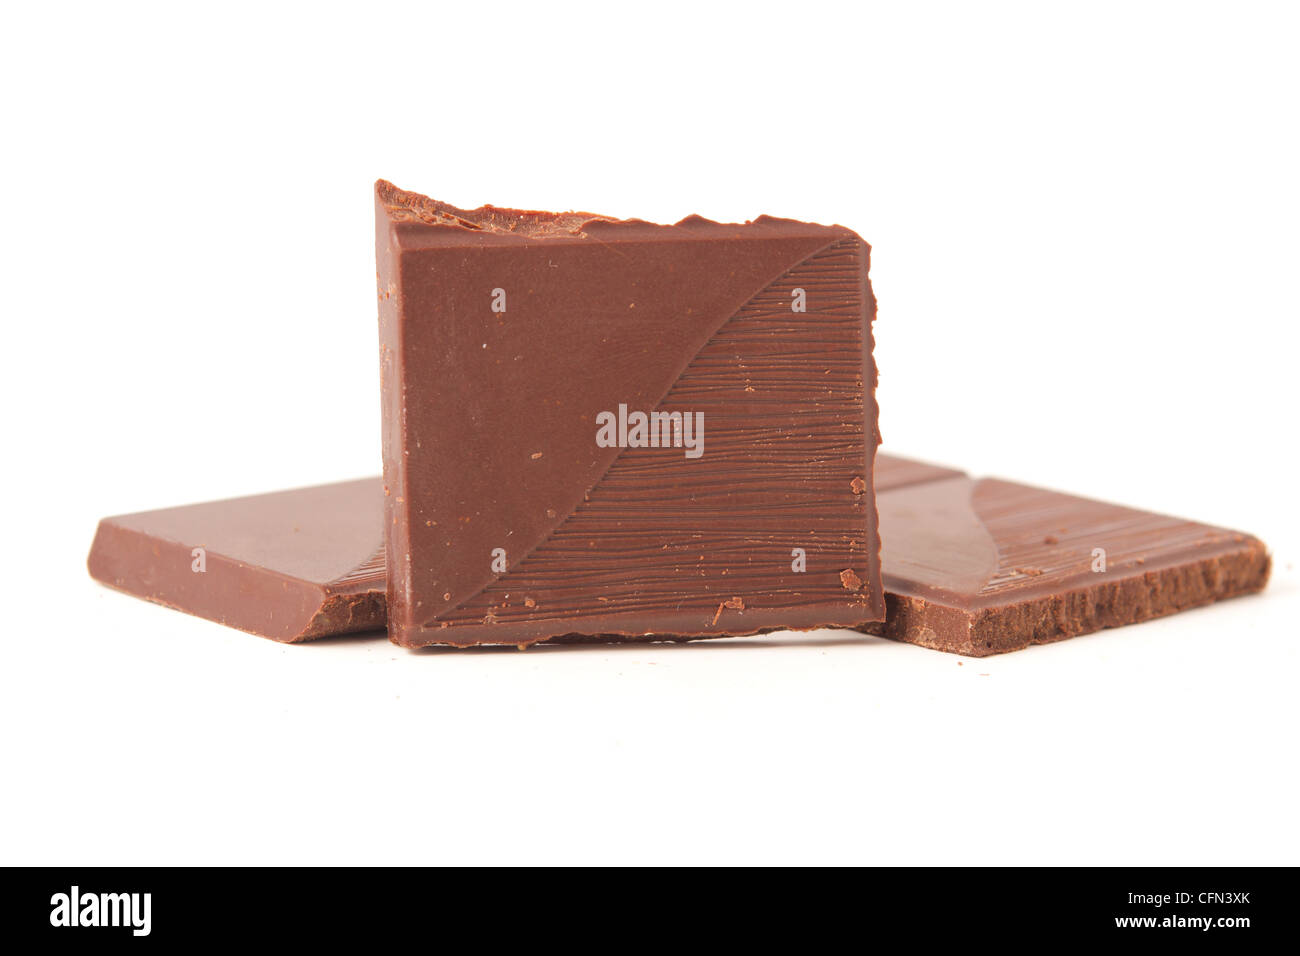 Chocolate bars - Stock Image